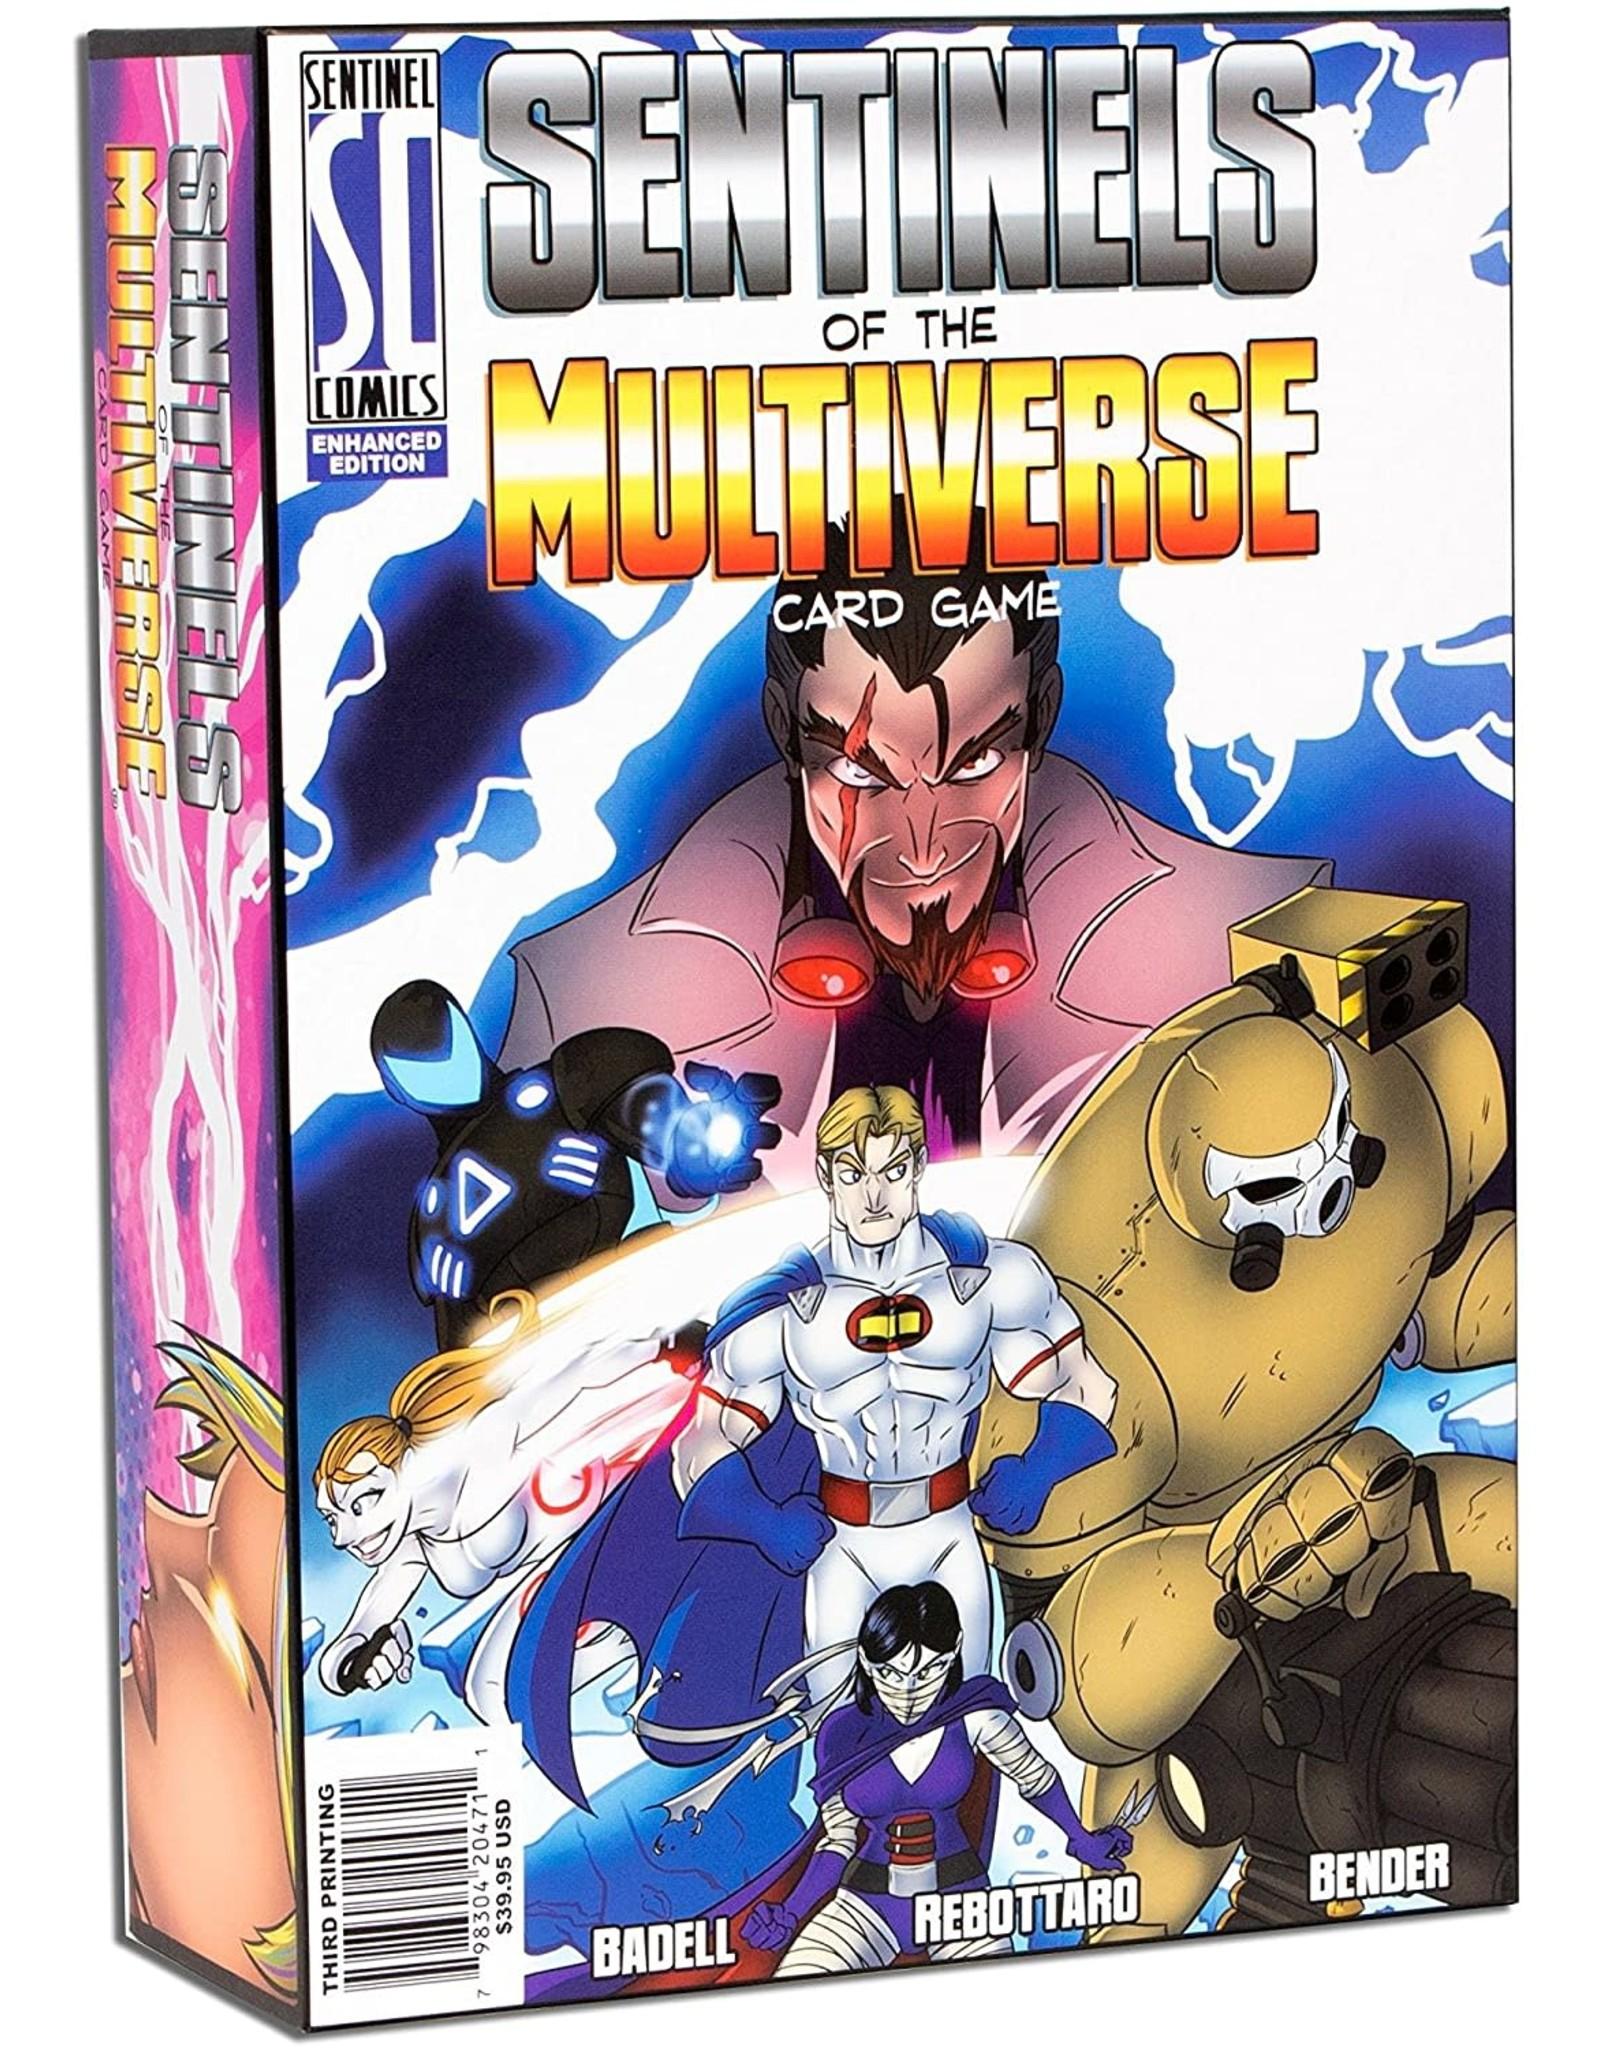 Sentinel Comics Sentinels of the Multiverse